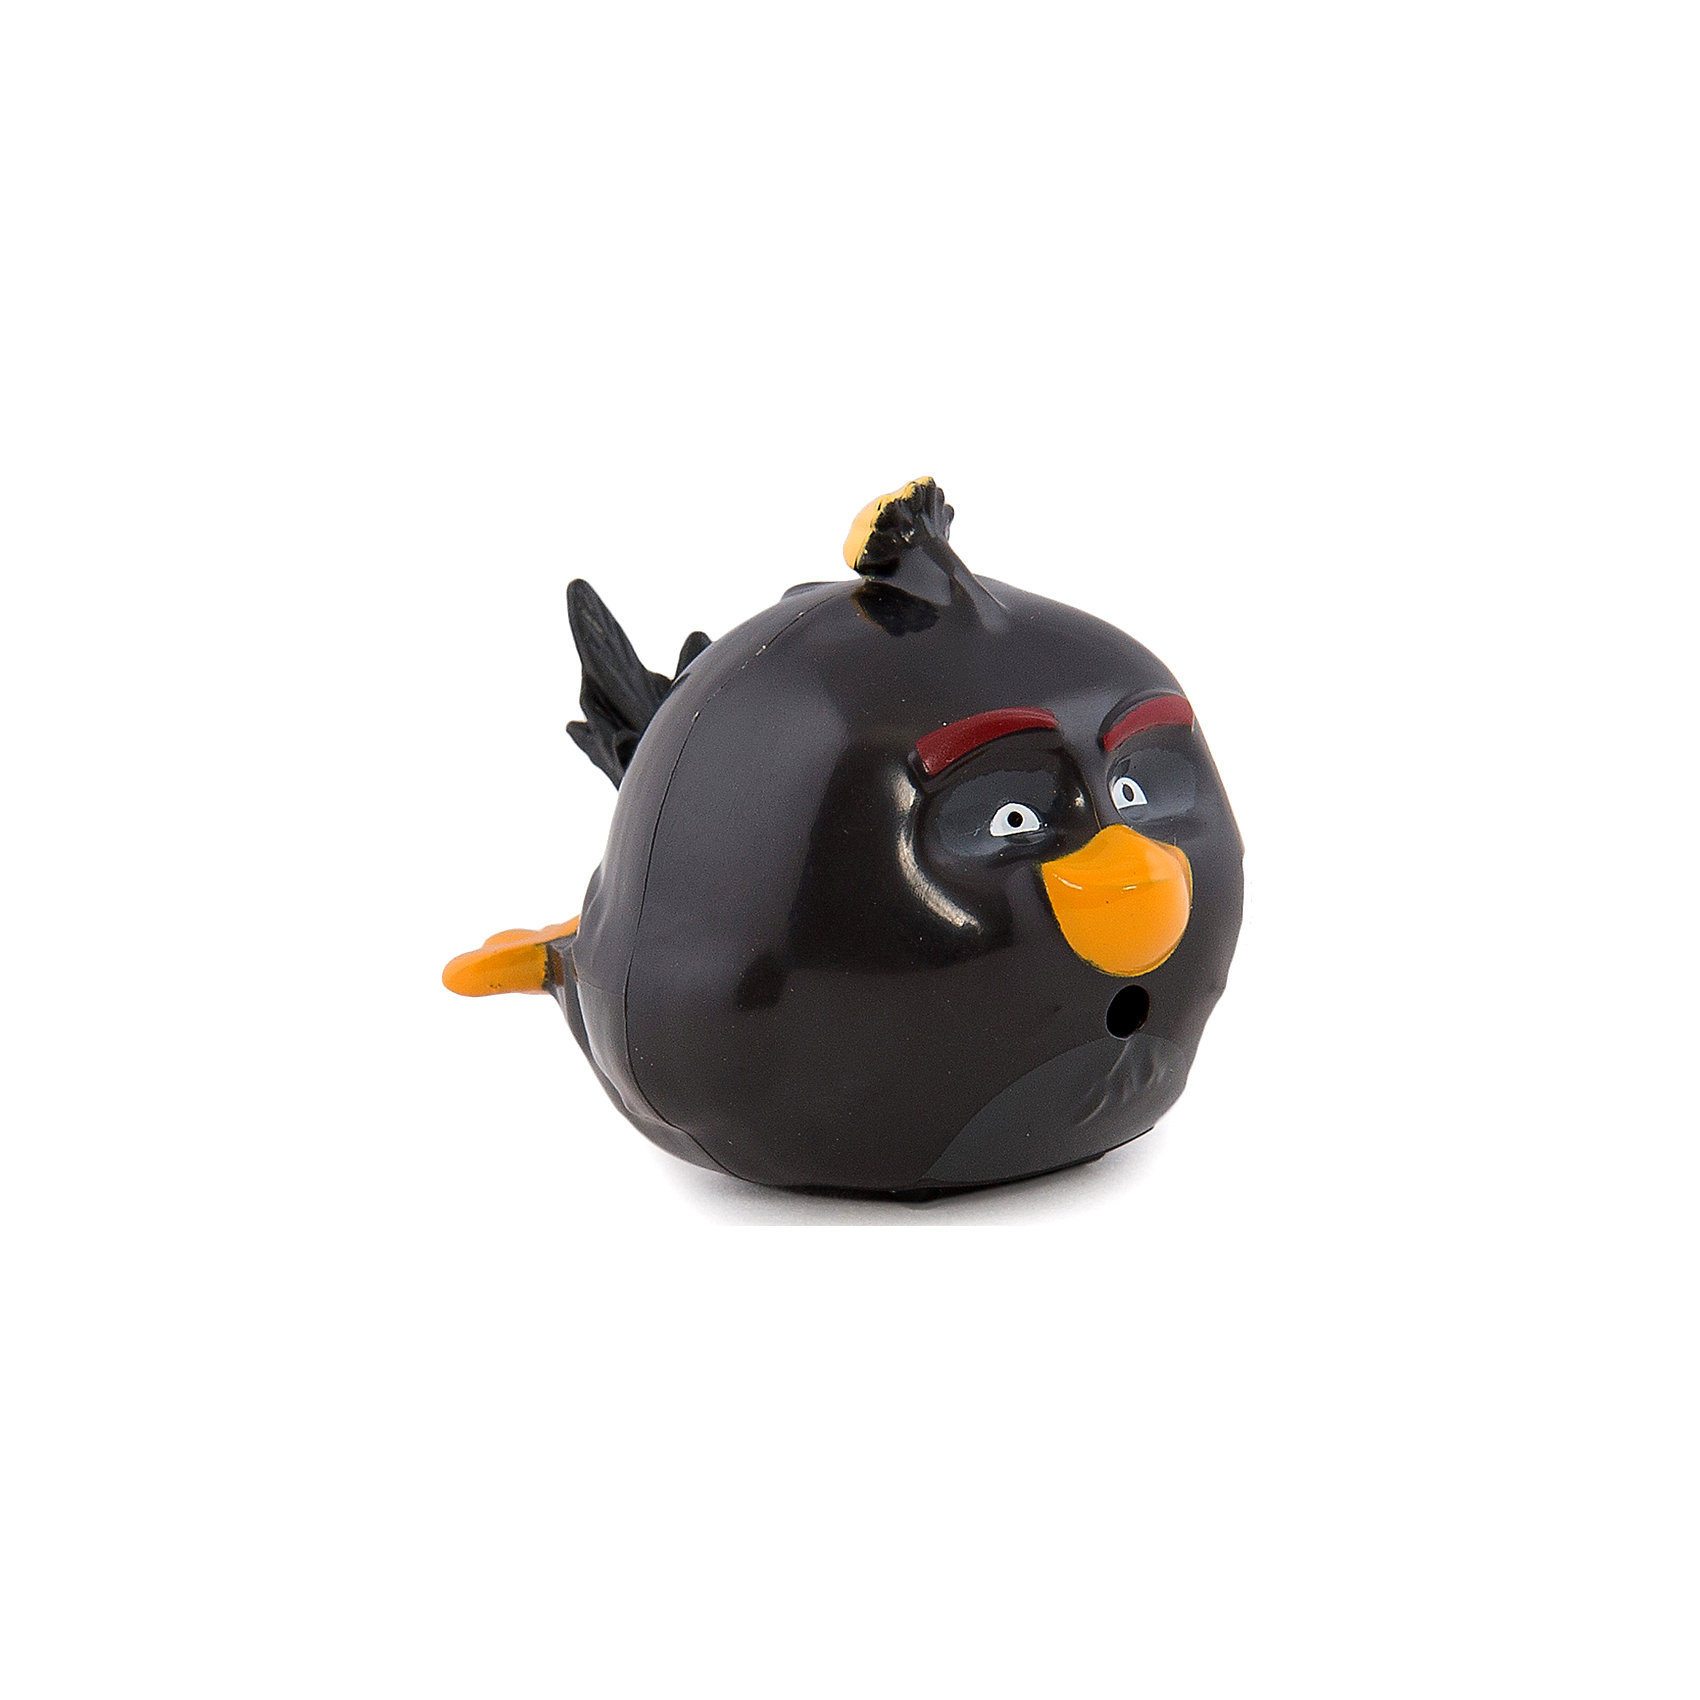 Spin Master Птичка на колесиках Бомб, Angry Birds spin master коллекционная фигурка сердитая птичка angry birds 90501 40073074